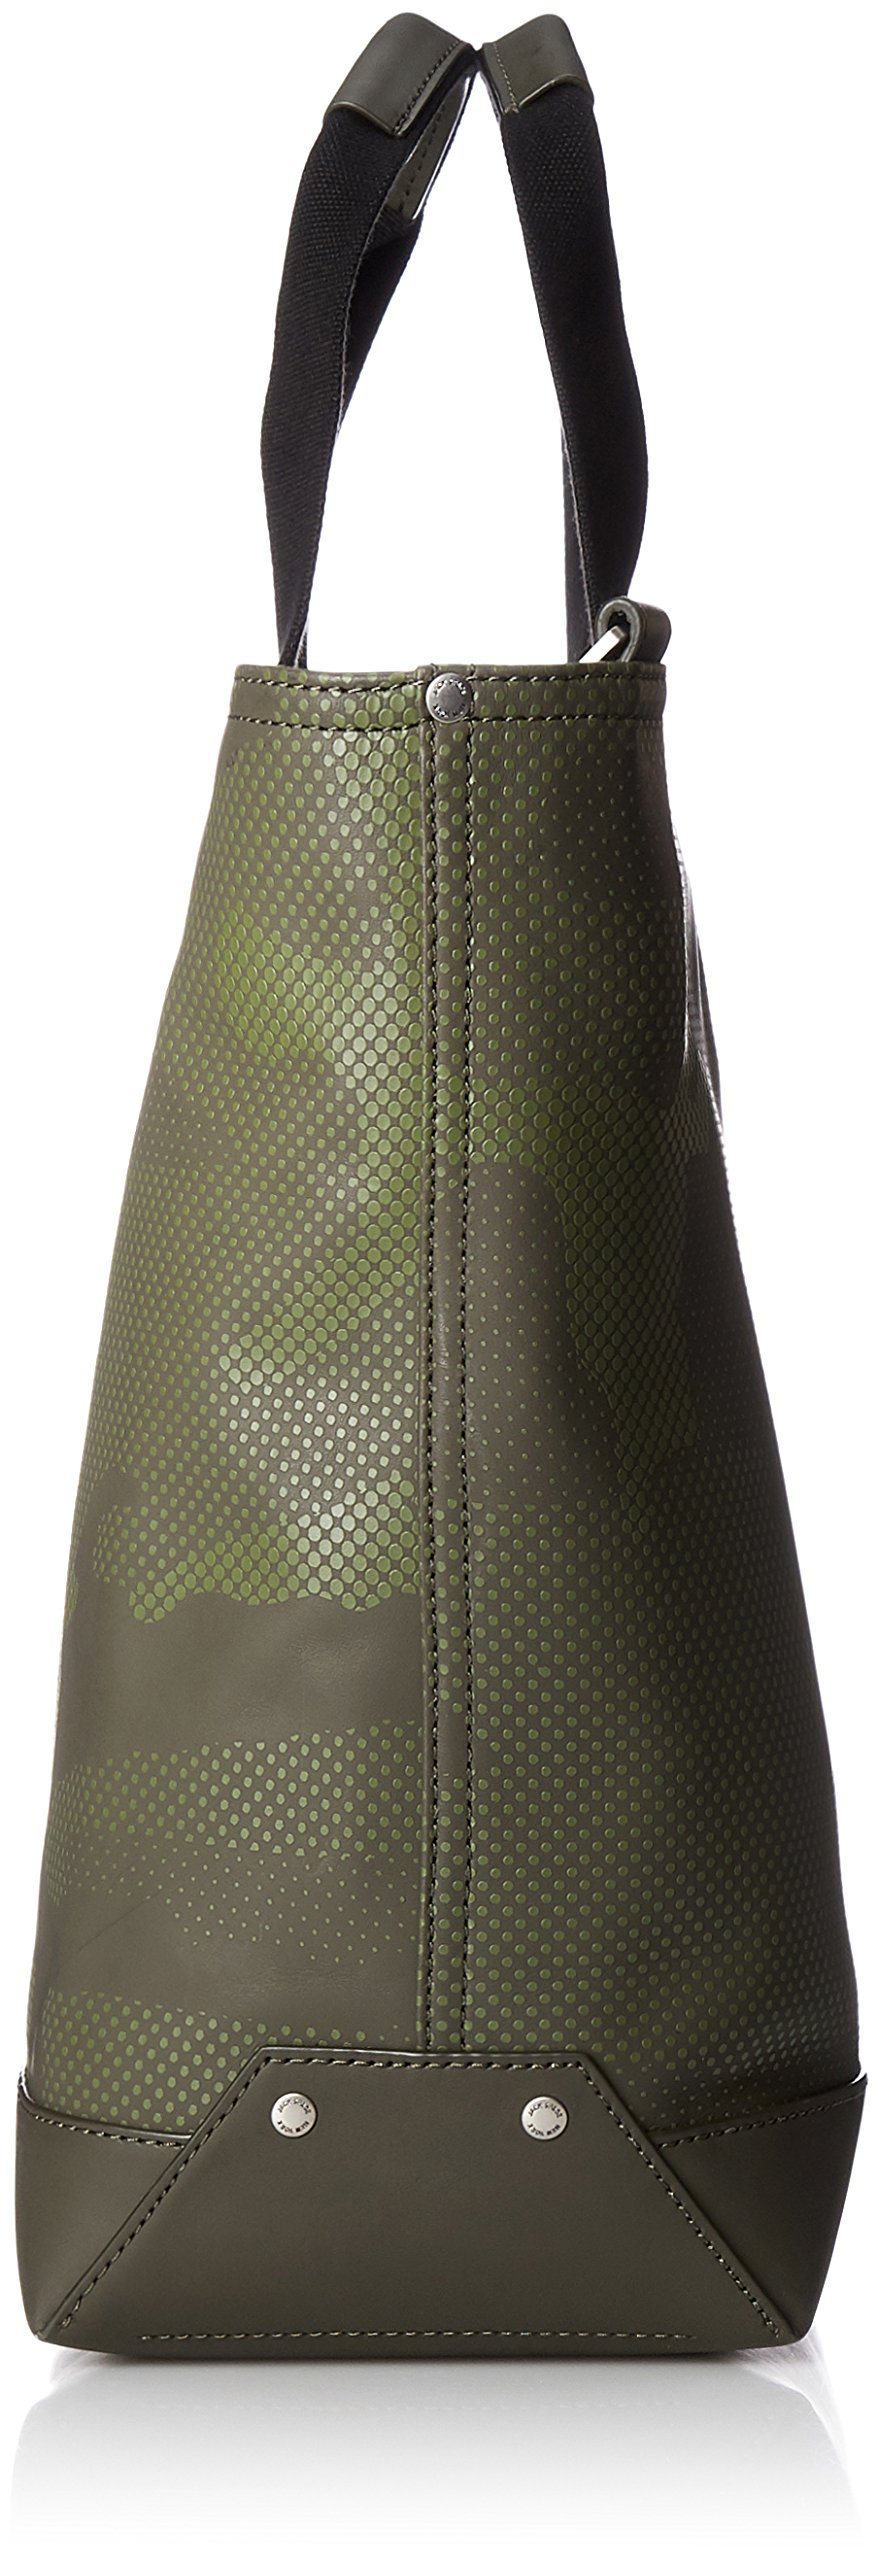 Jack Spade Men's Camo Dots Coal Bag, Army Green by Jack Spade (Image #3)